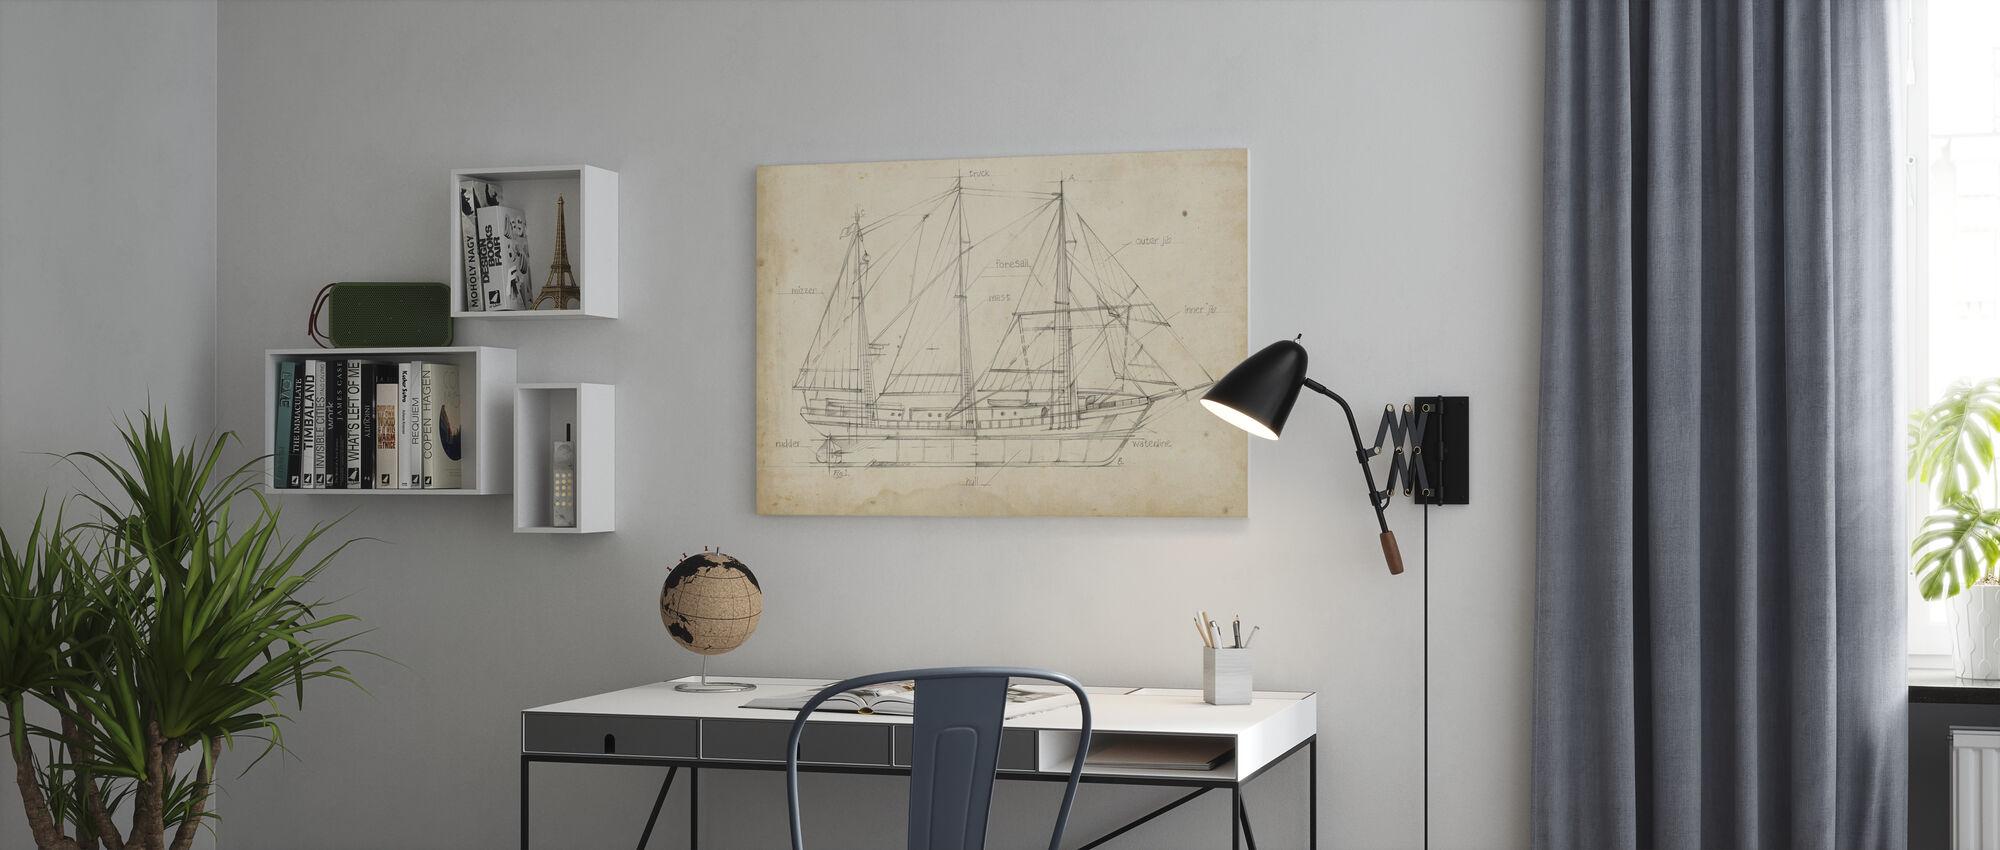 Sailboat Blueprint - Canvas print - Office